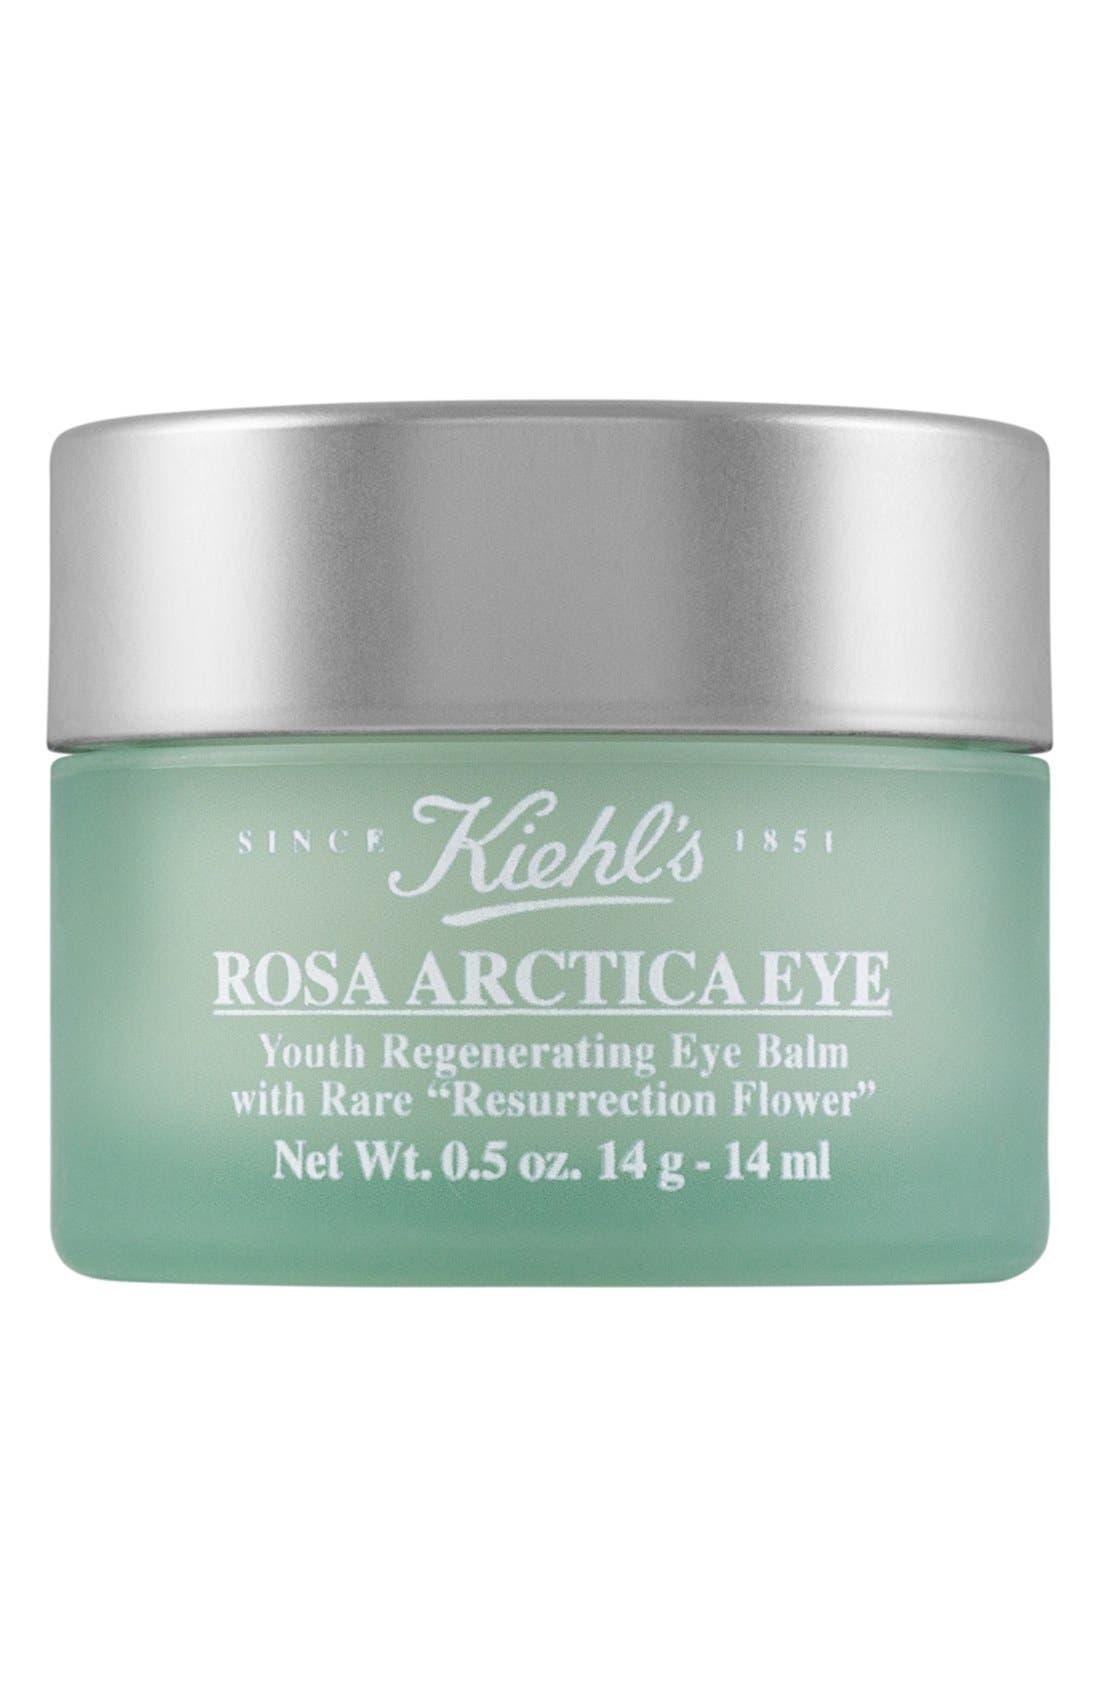 Kiehl's Since 1851 'Rosa Arctica Eye' Youth Regenerating Eye Balm